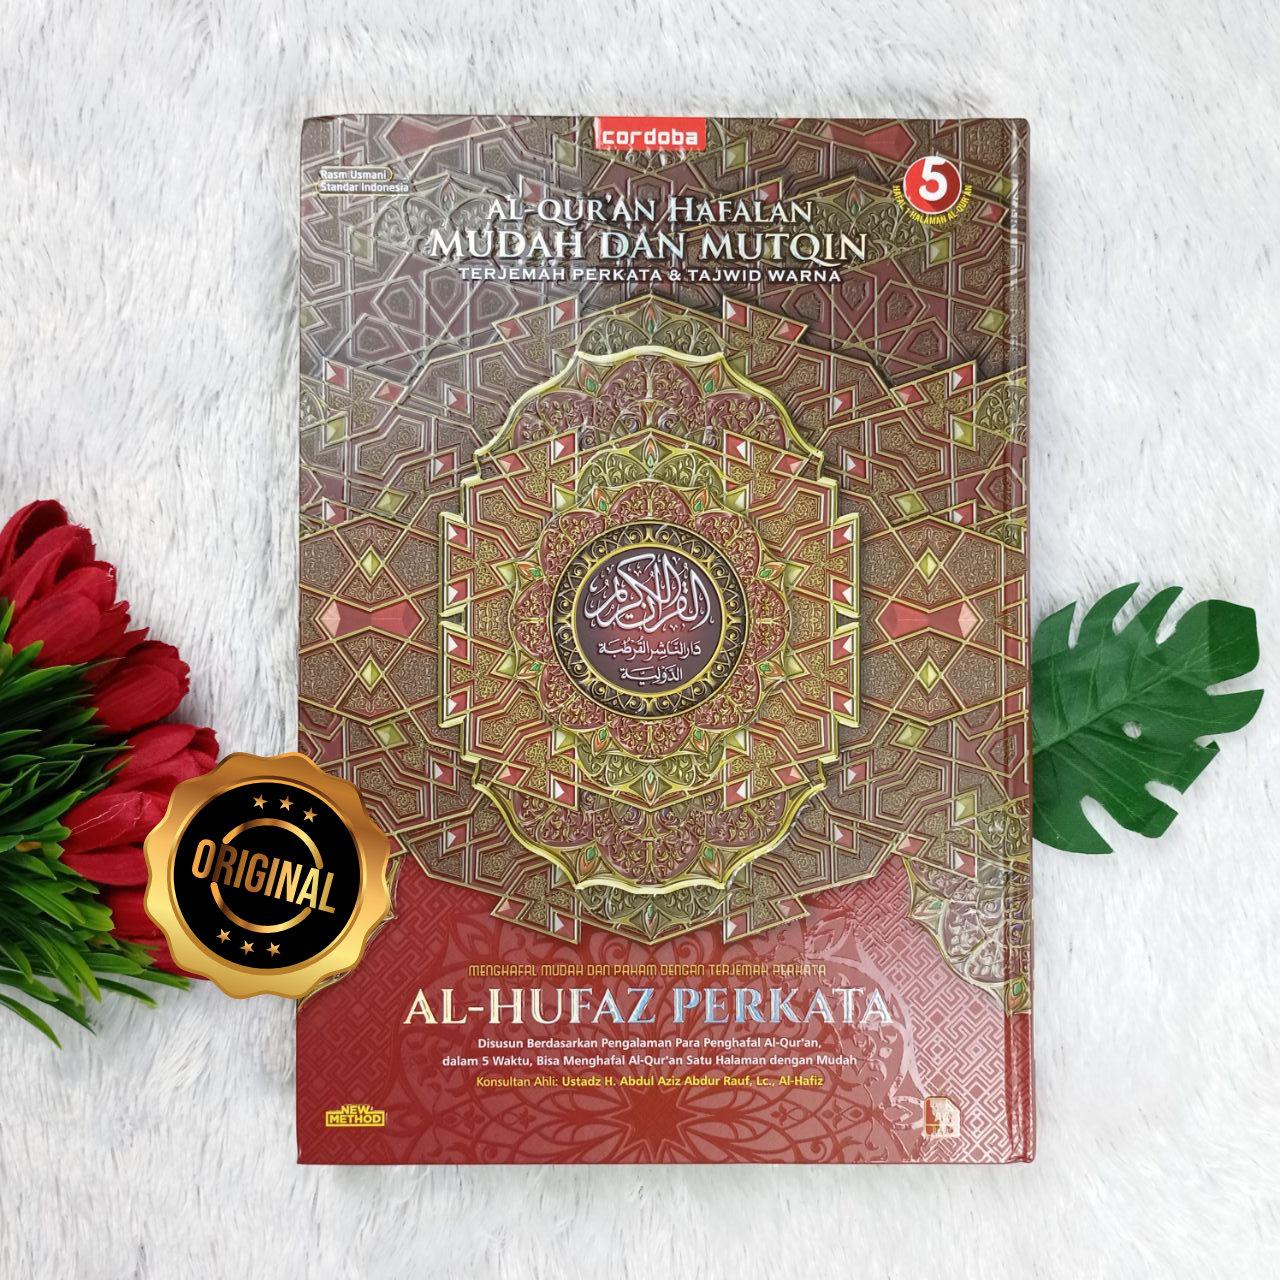 Al-Qur'an Hafalan Mudah Dan Mutqin Terjemah Al-Hufaz Perkata Ukuran A4